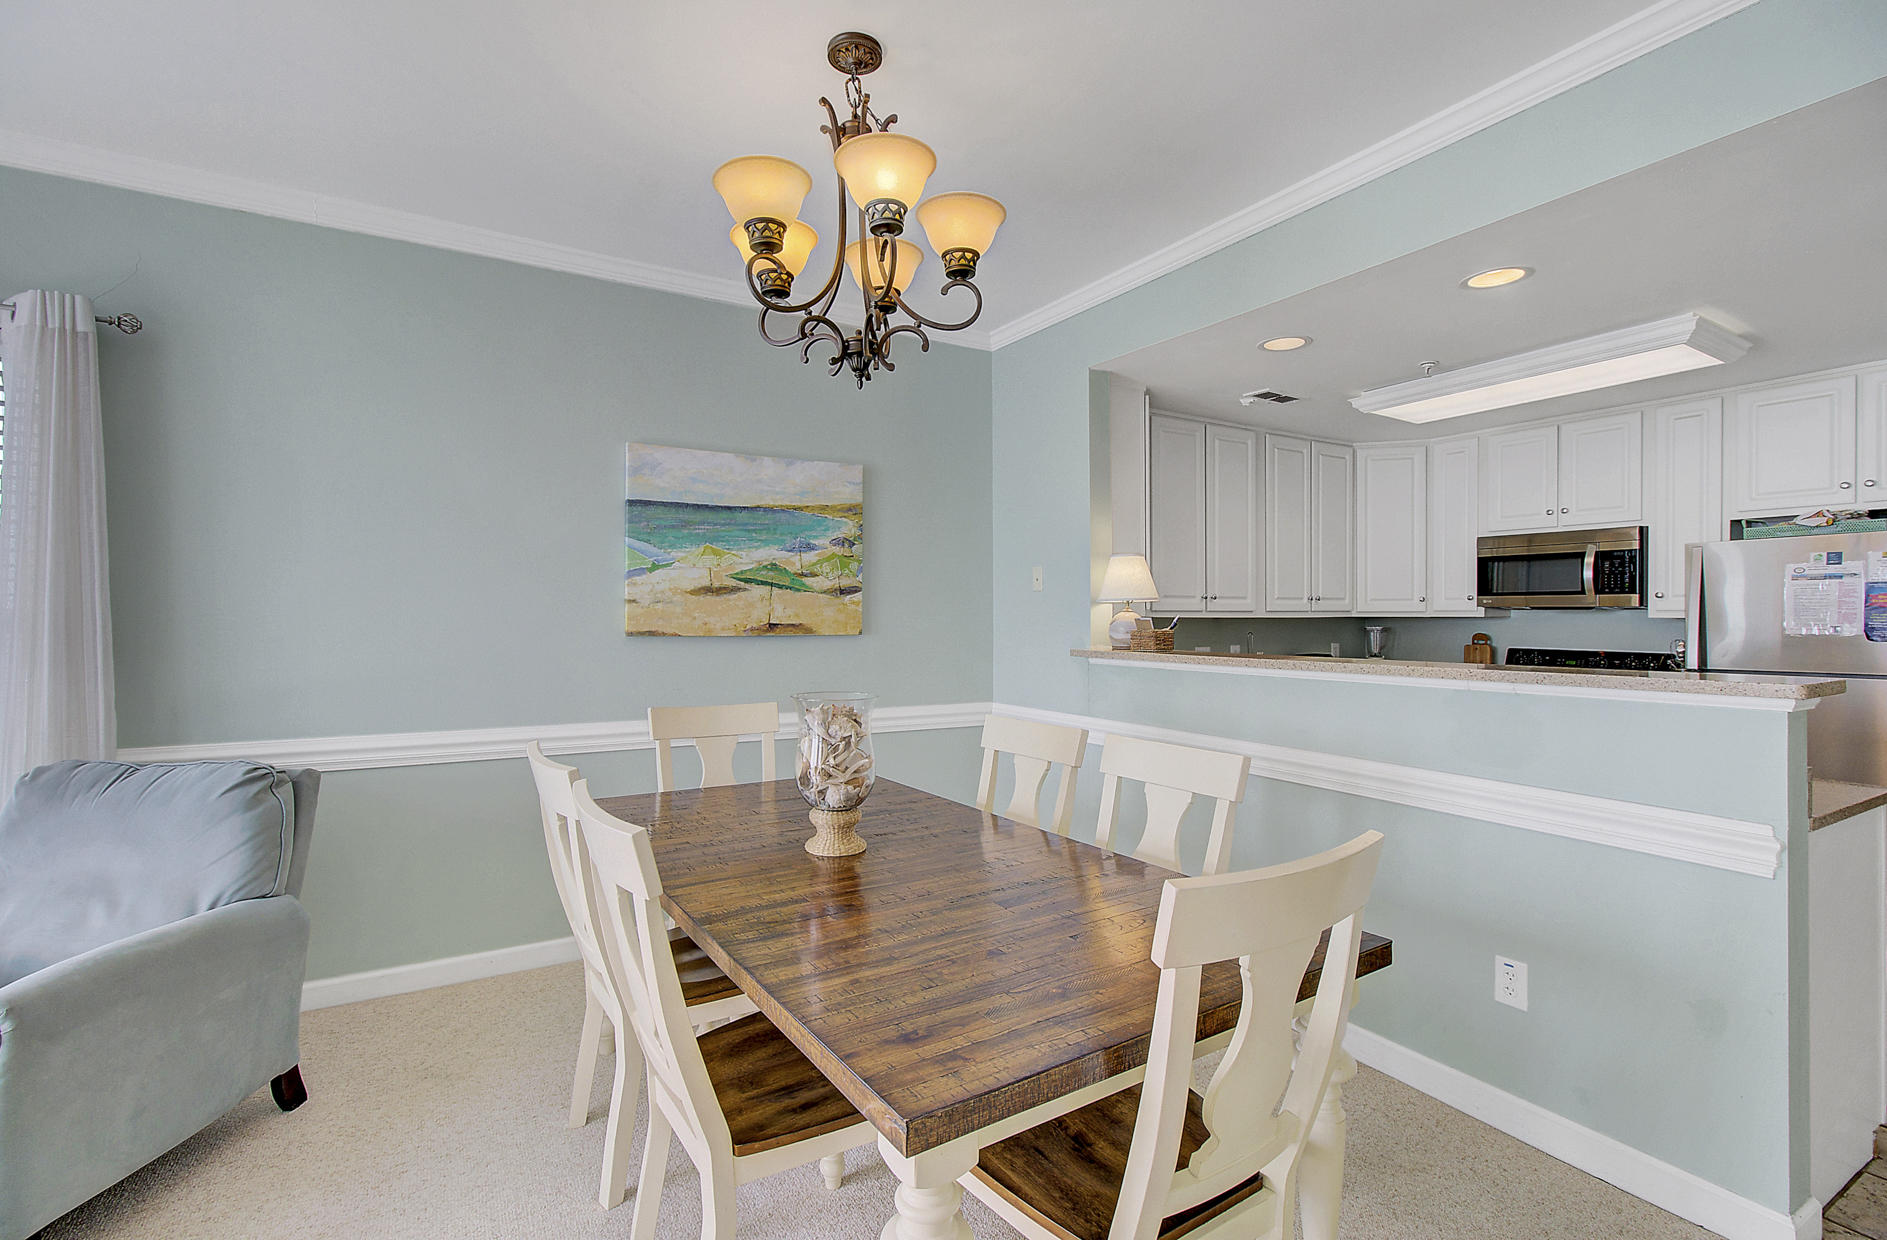 Seaside Villas I Homes For Sale - 111 Arctic, Folly Beach, SC - 6